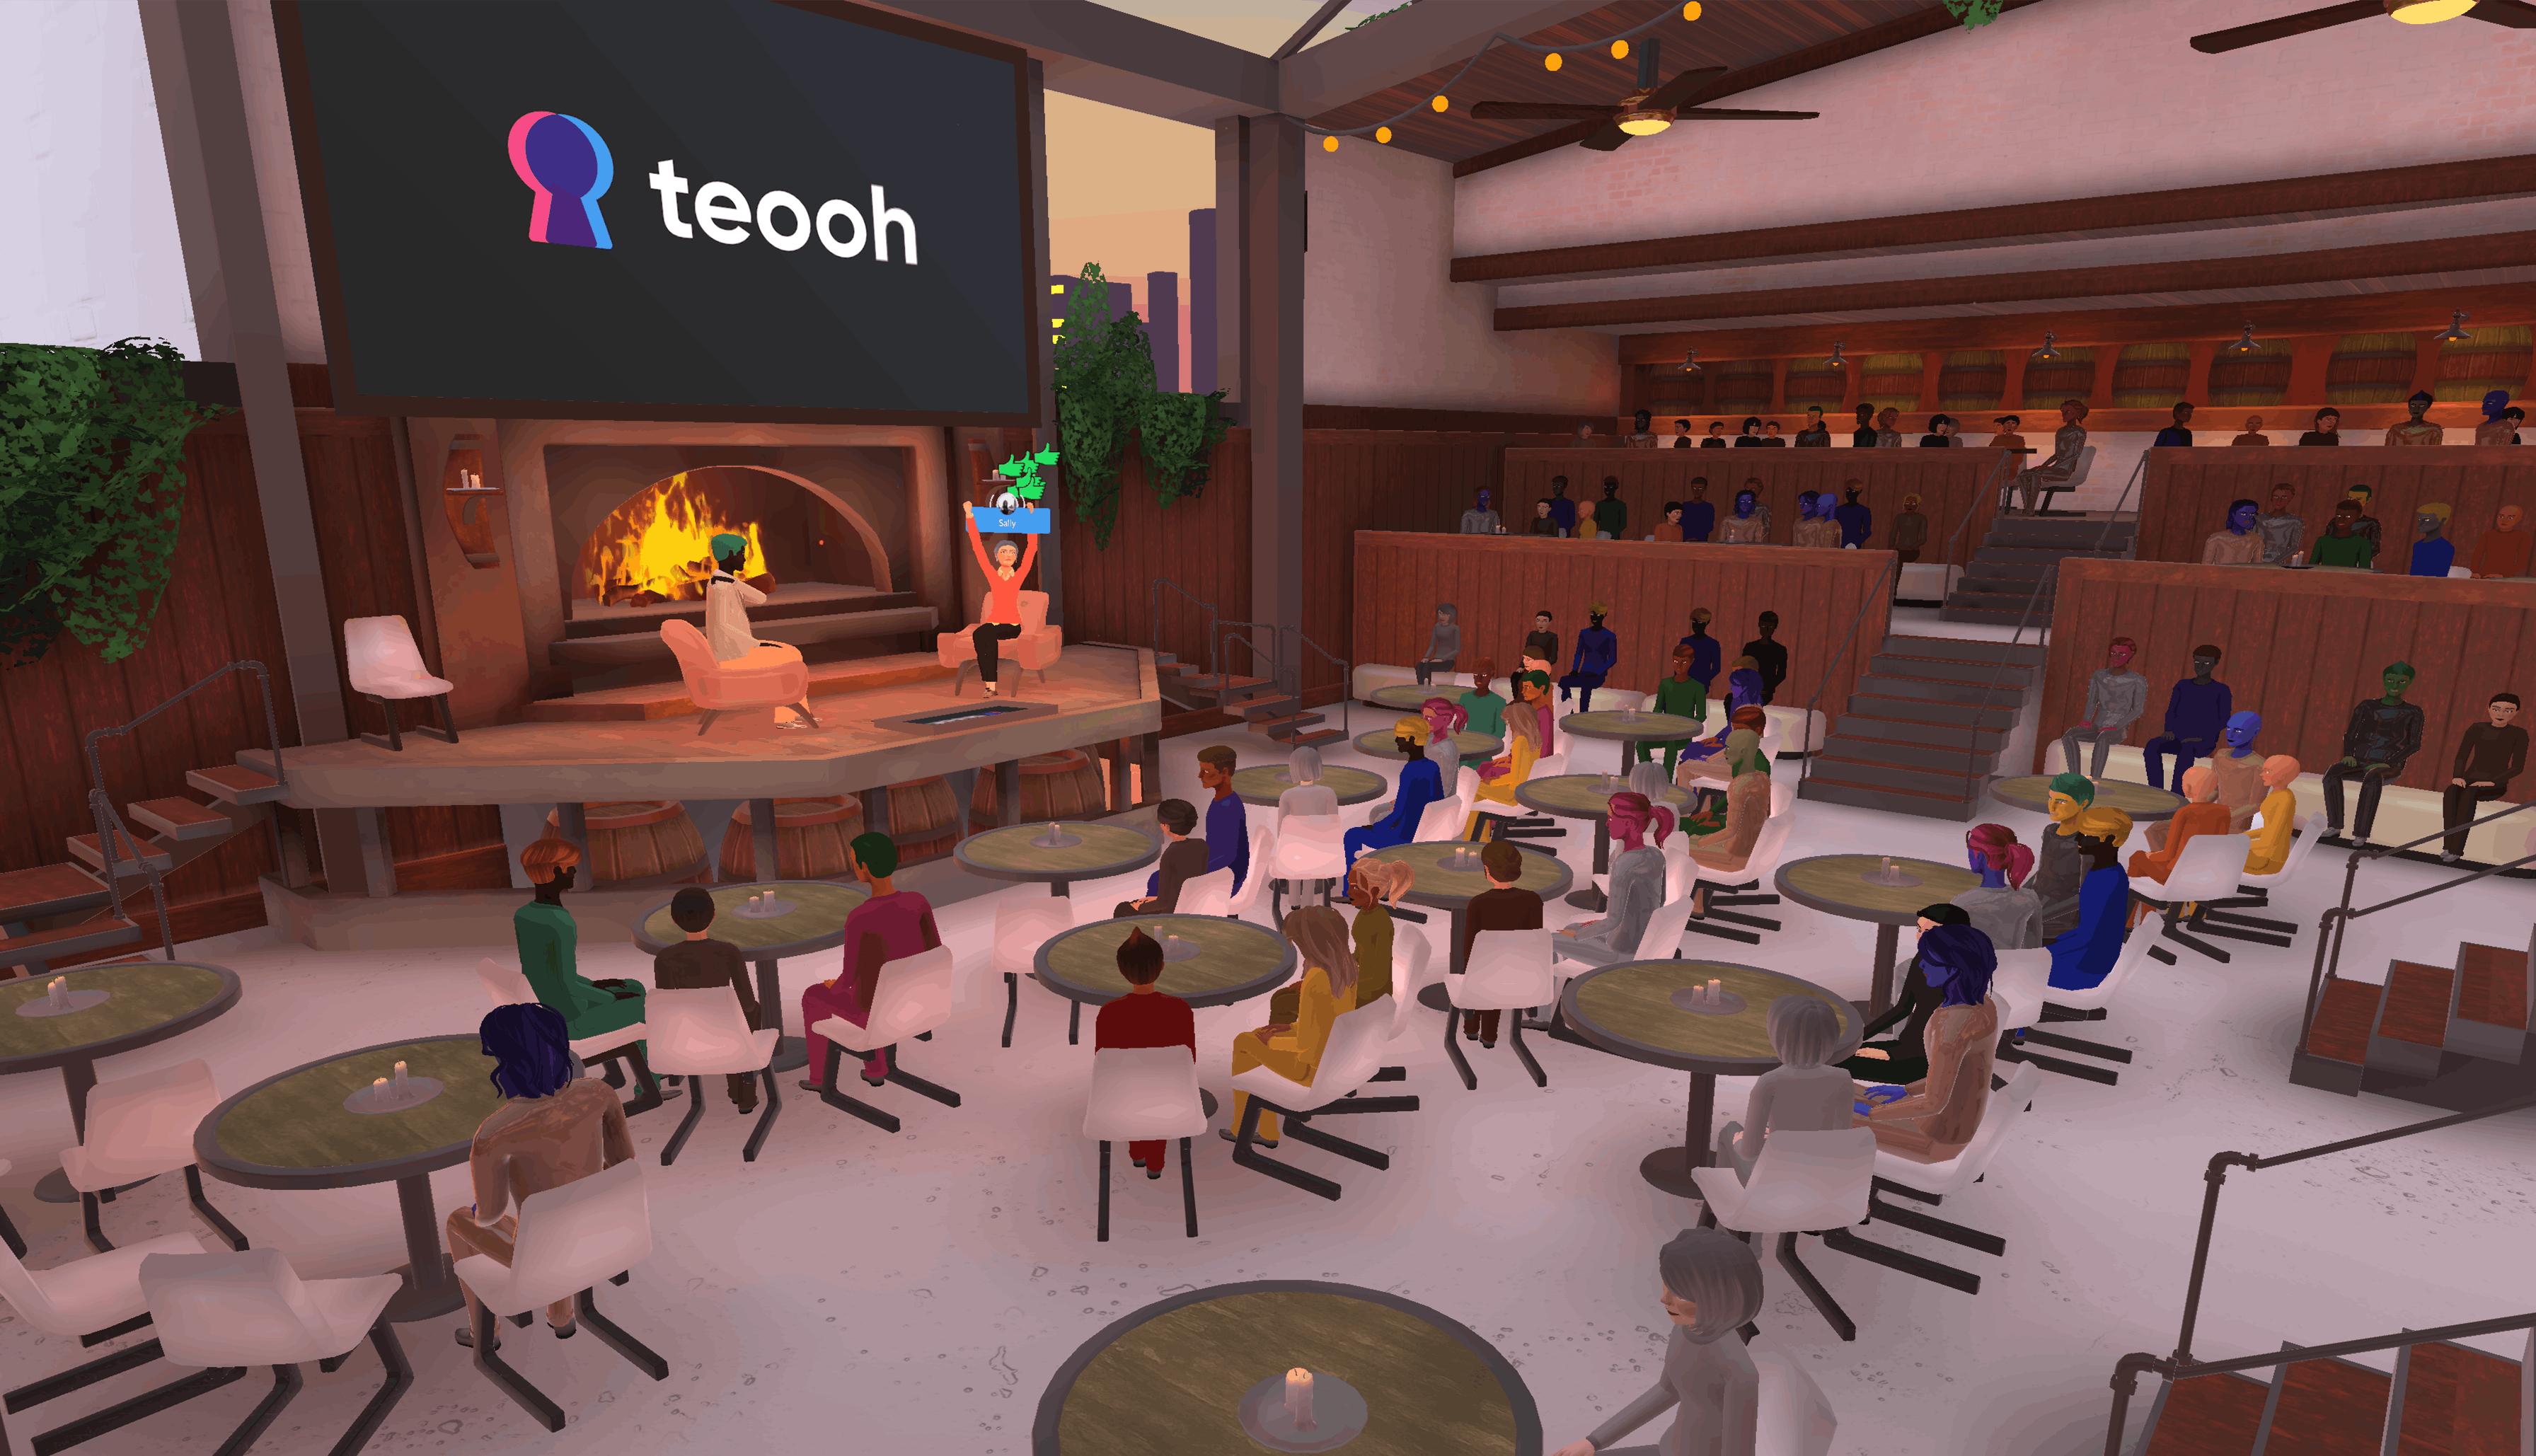 hosting community meetups in Teooh's avatar-based virtual platform